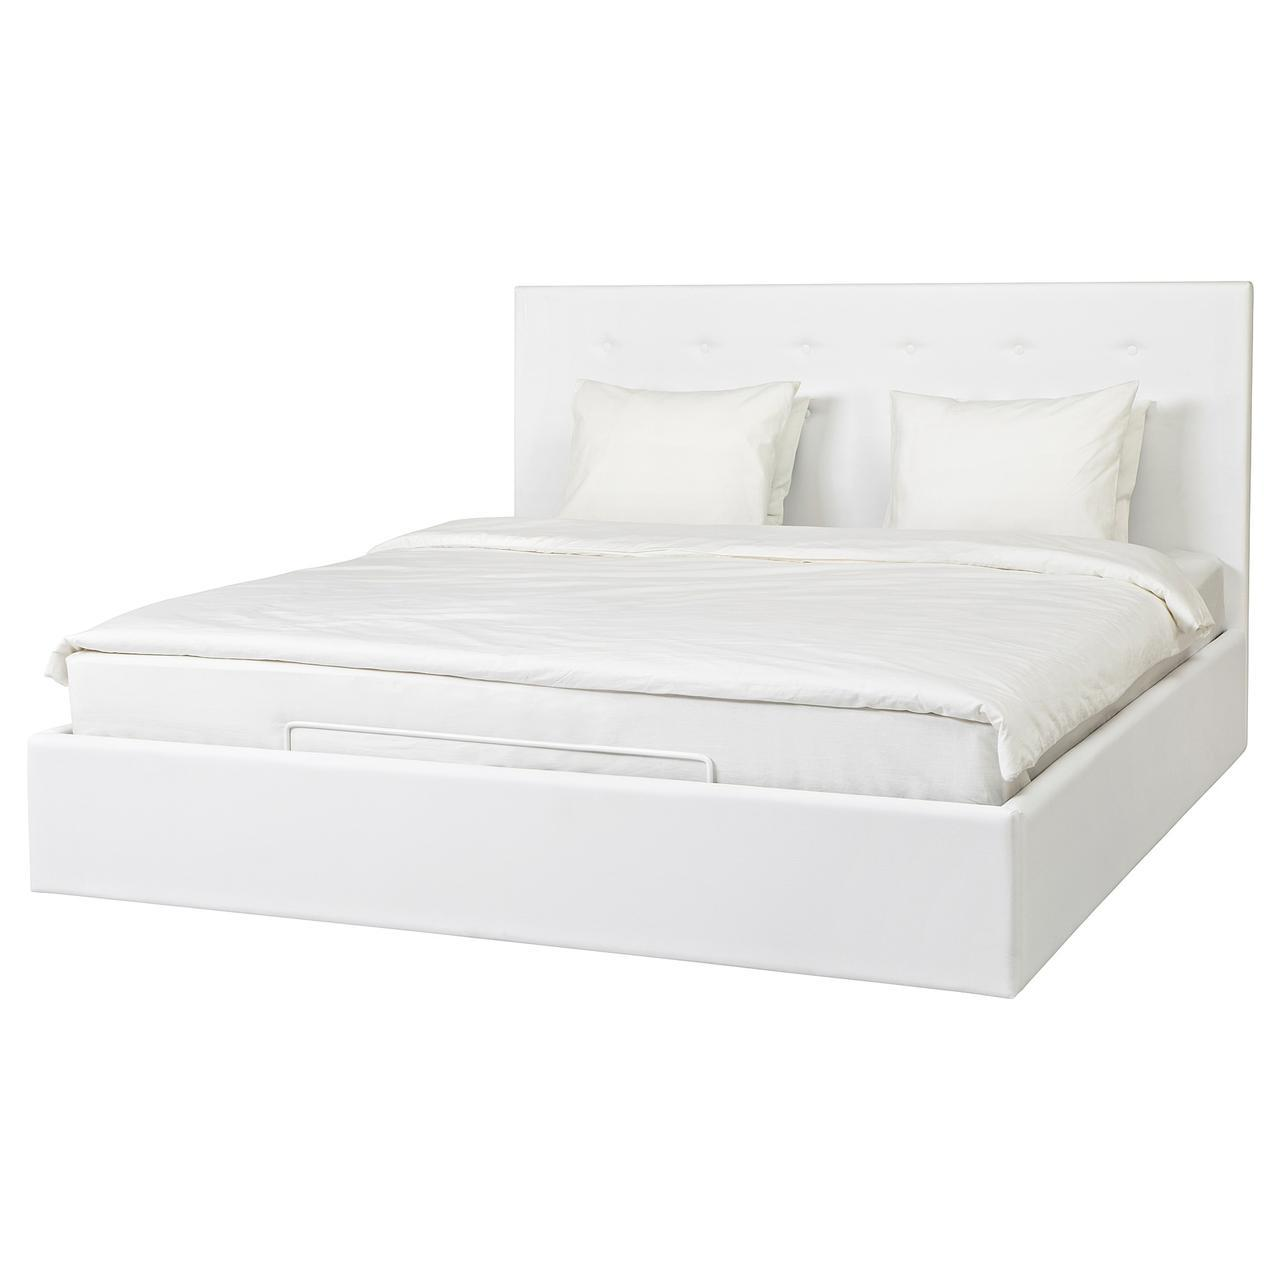 IKEA GVARV (604.097.17) Кровать с подъемным механизмом, Idhult white